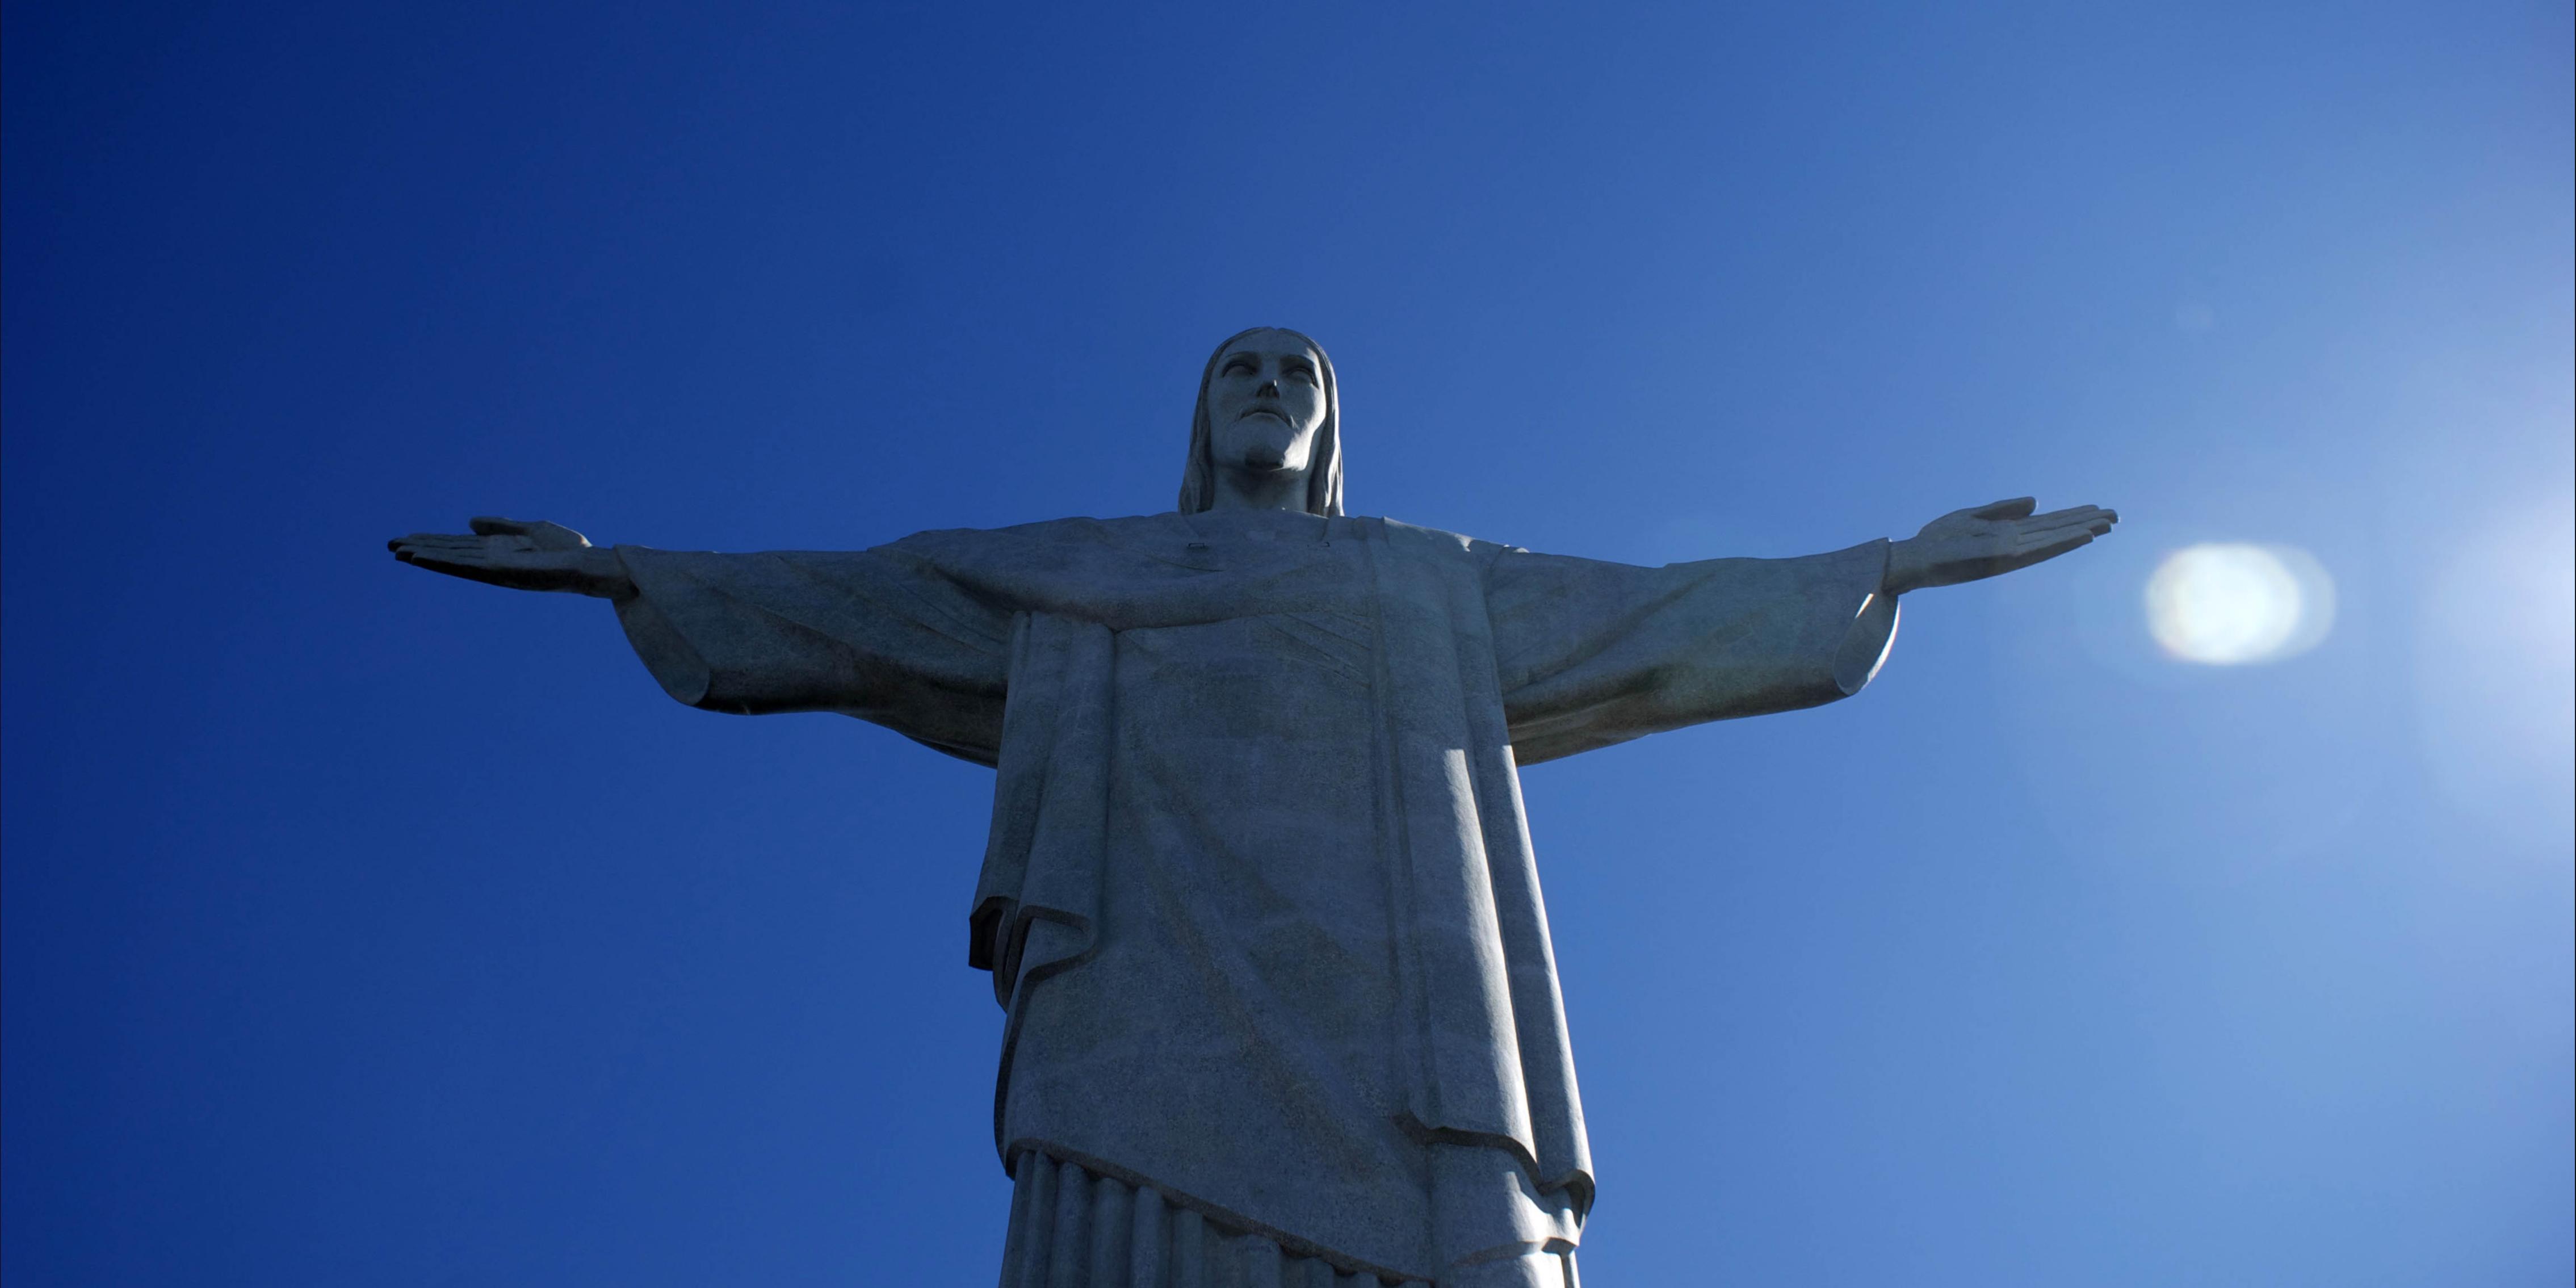 A work by Does - Rio de janeiro brazil 1